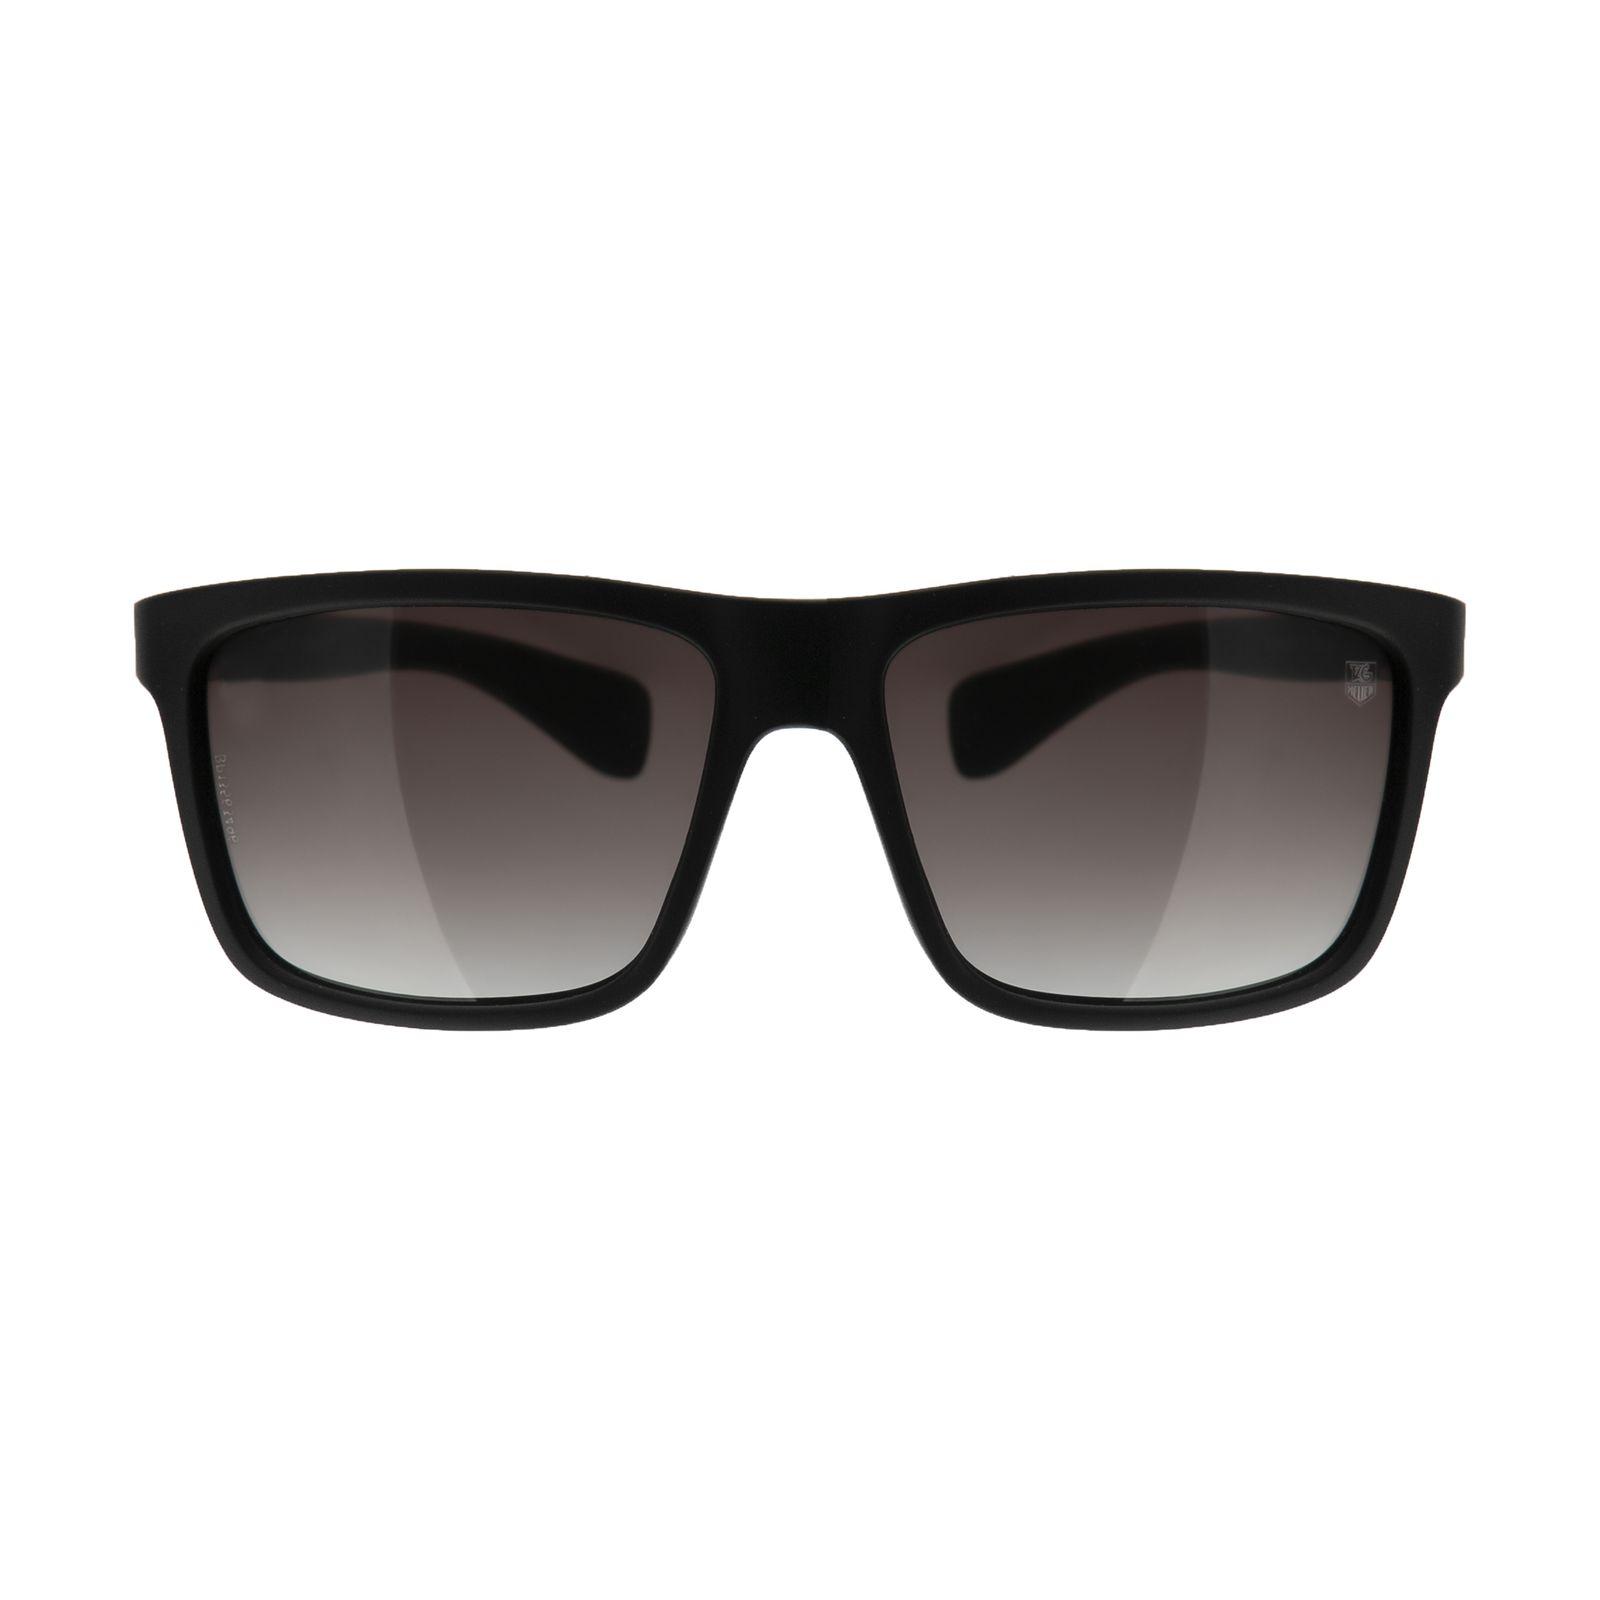 عینک آفتابی تگ هویر مدل 9303 -  - 2